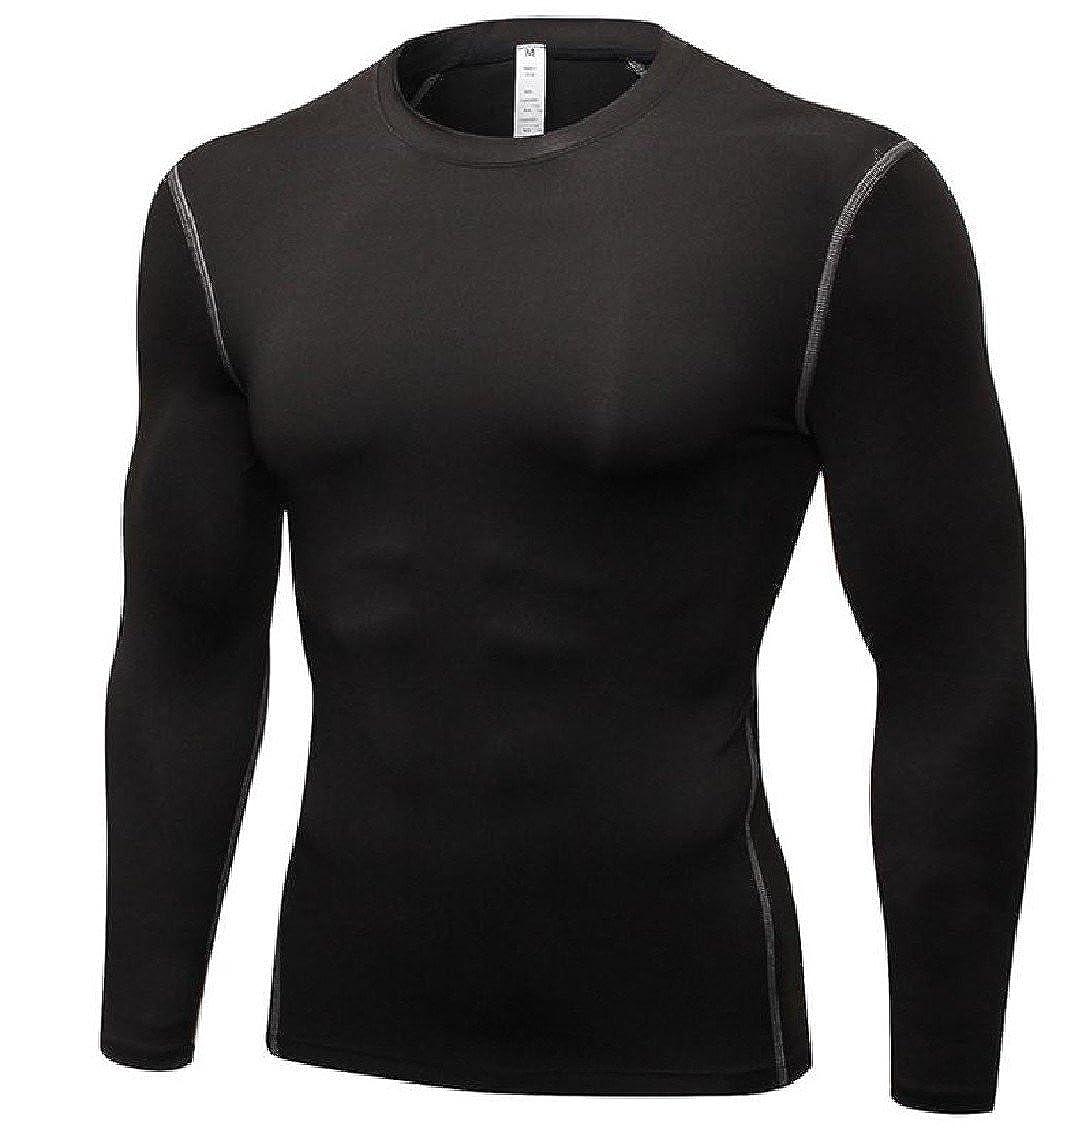 KaWaYiMen Kawayi Mens Fast Drying Brushed Novelty Tights/Pure Color Training Tunic Top Tees